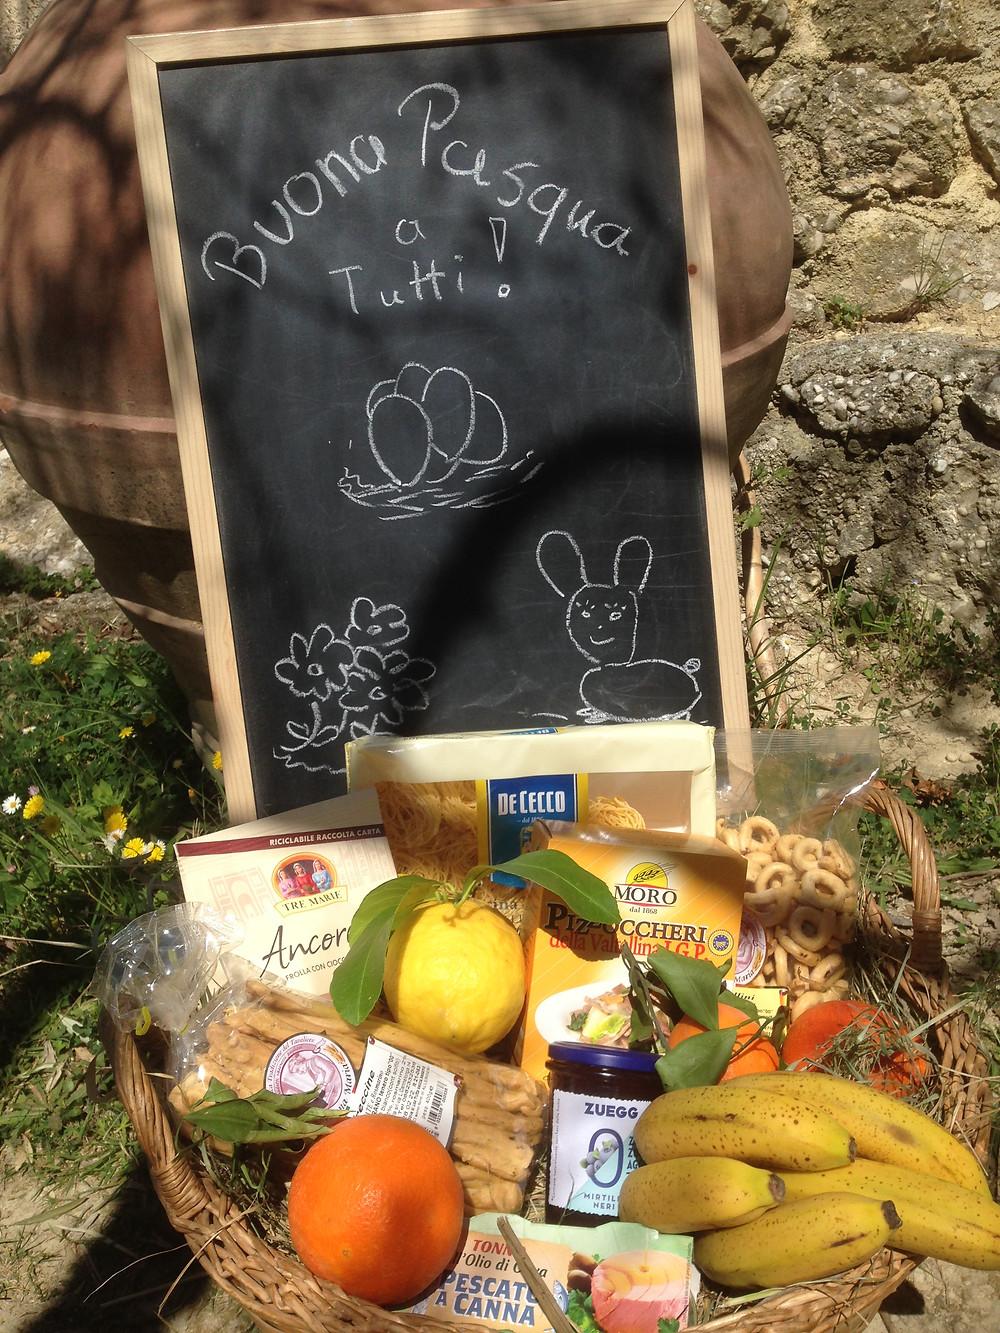 Frohe Ostern Osterfest 2021 Fülle Fruchtbarkeitsfest spirituelle Bedeutung Frühlingsfest Opferlamm Osterlamm Buona Pasqua